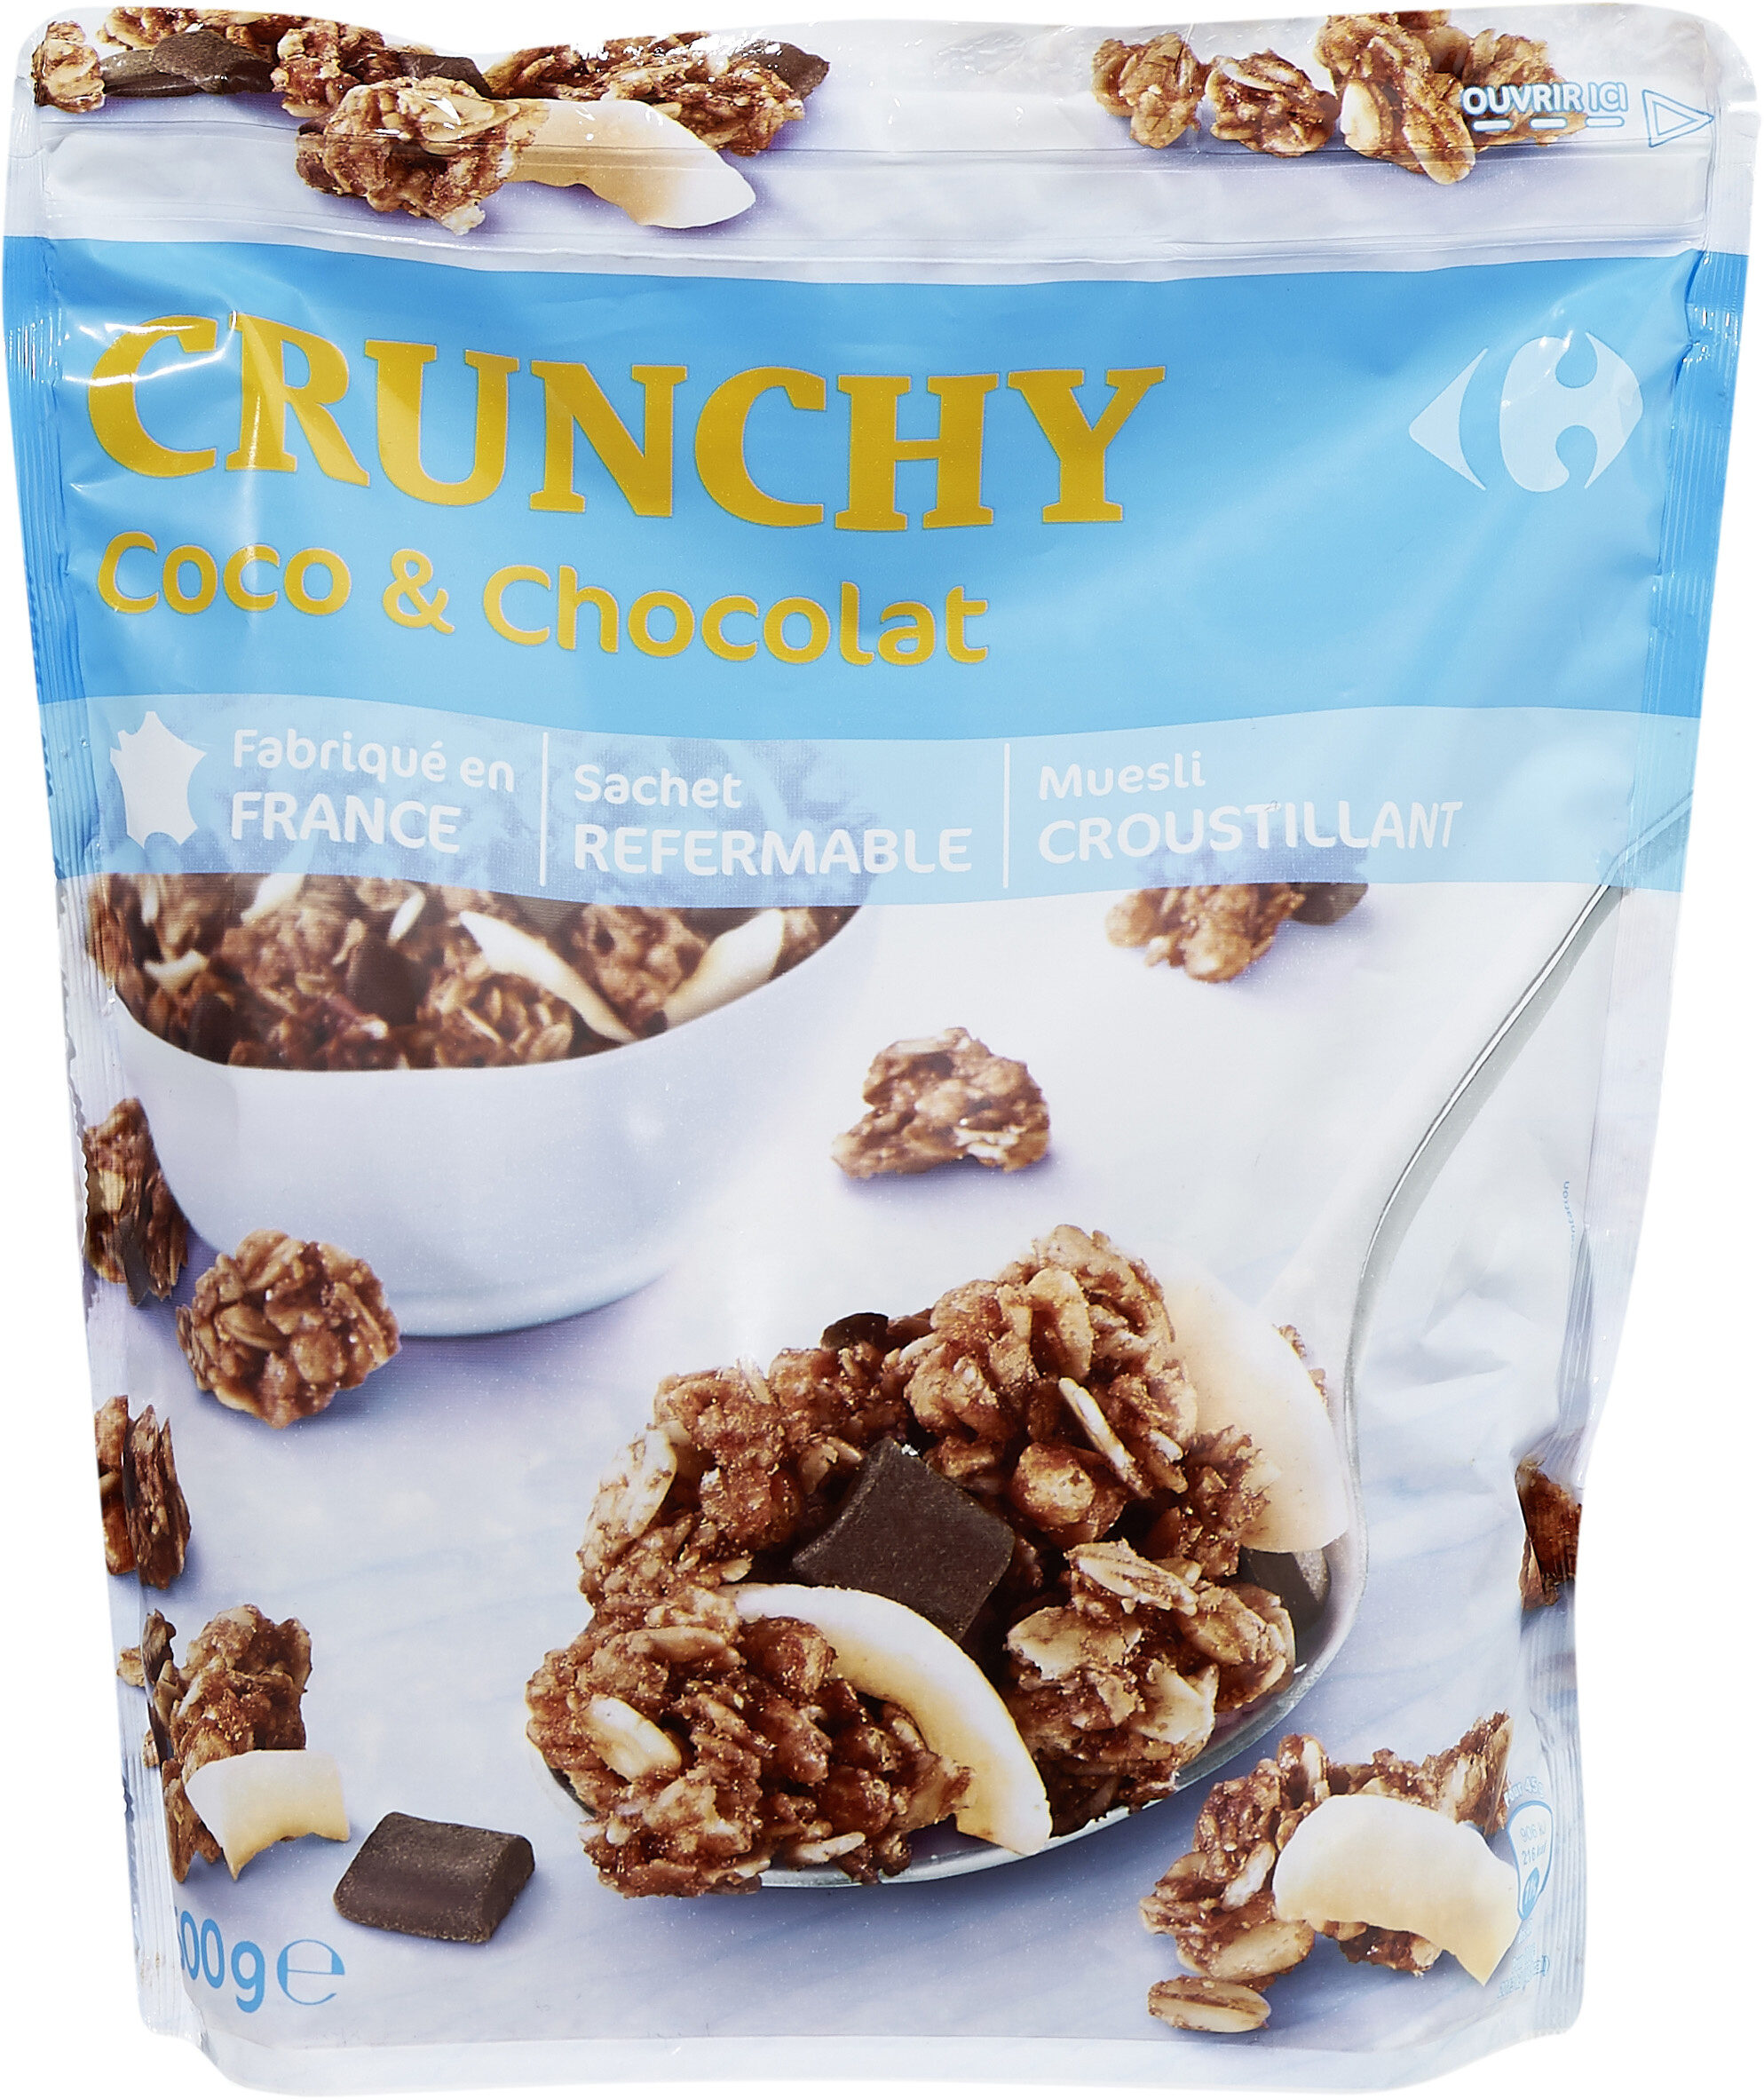 Crunchy Coco & Chocolat - Muesli croustillant - Produit - fr